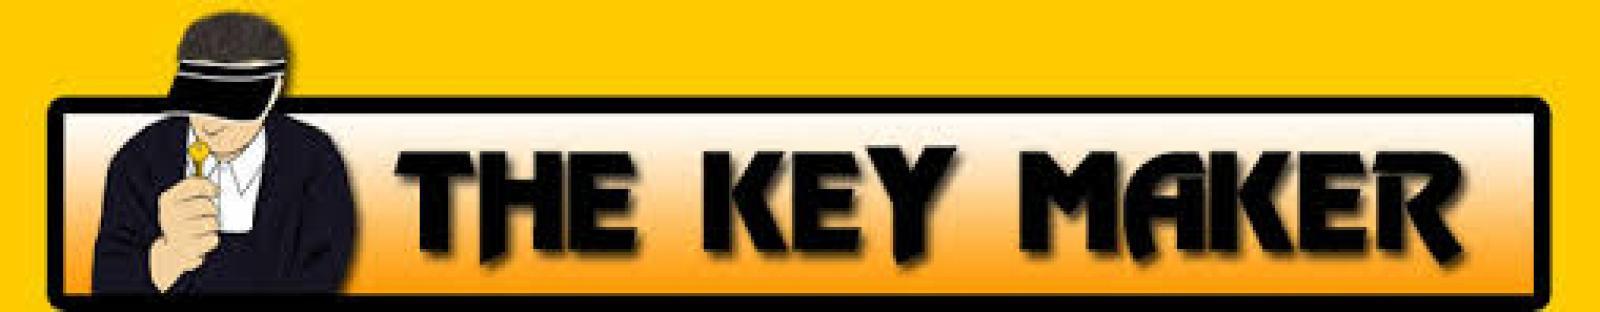 Chhavi Singh Gehlot    Key Maker